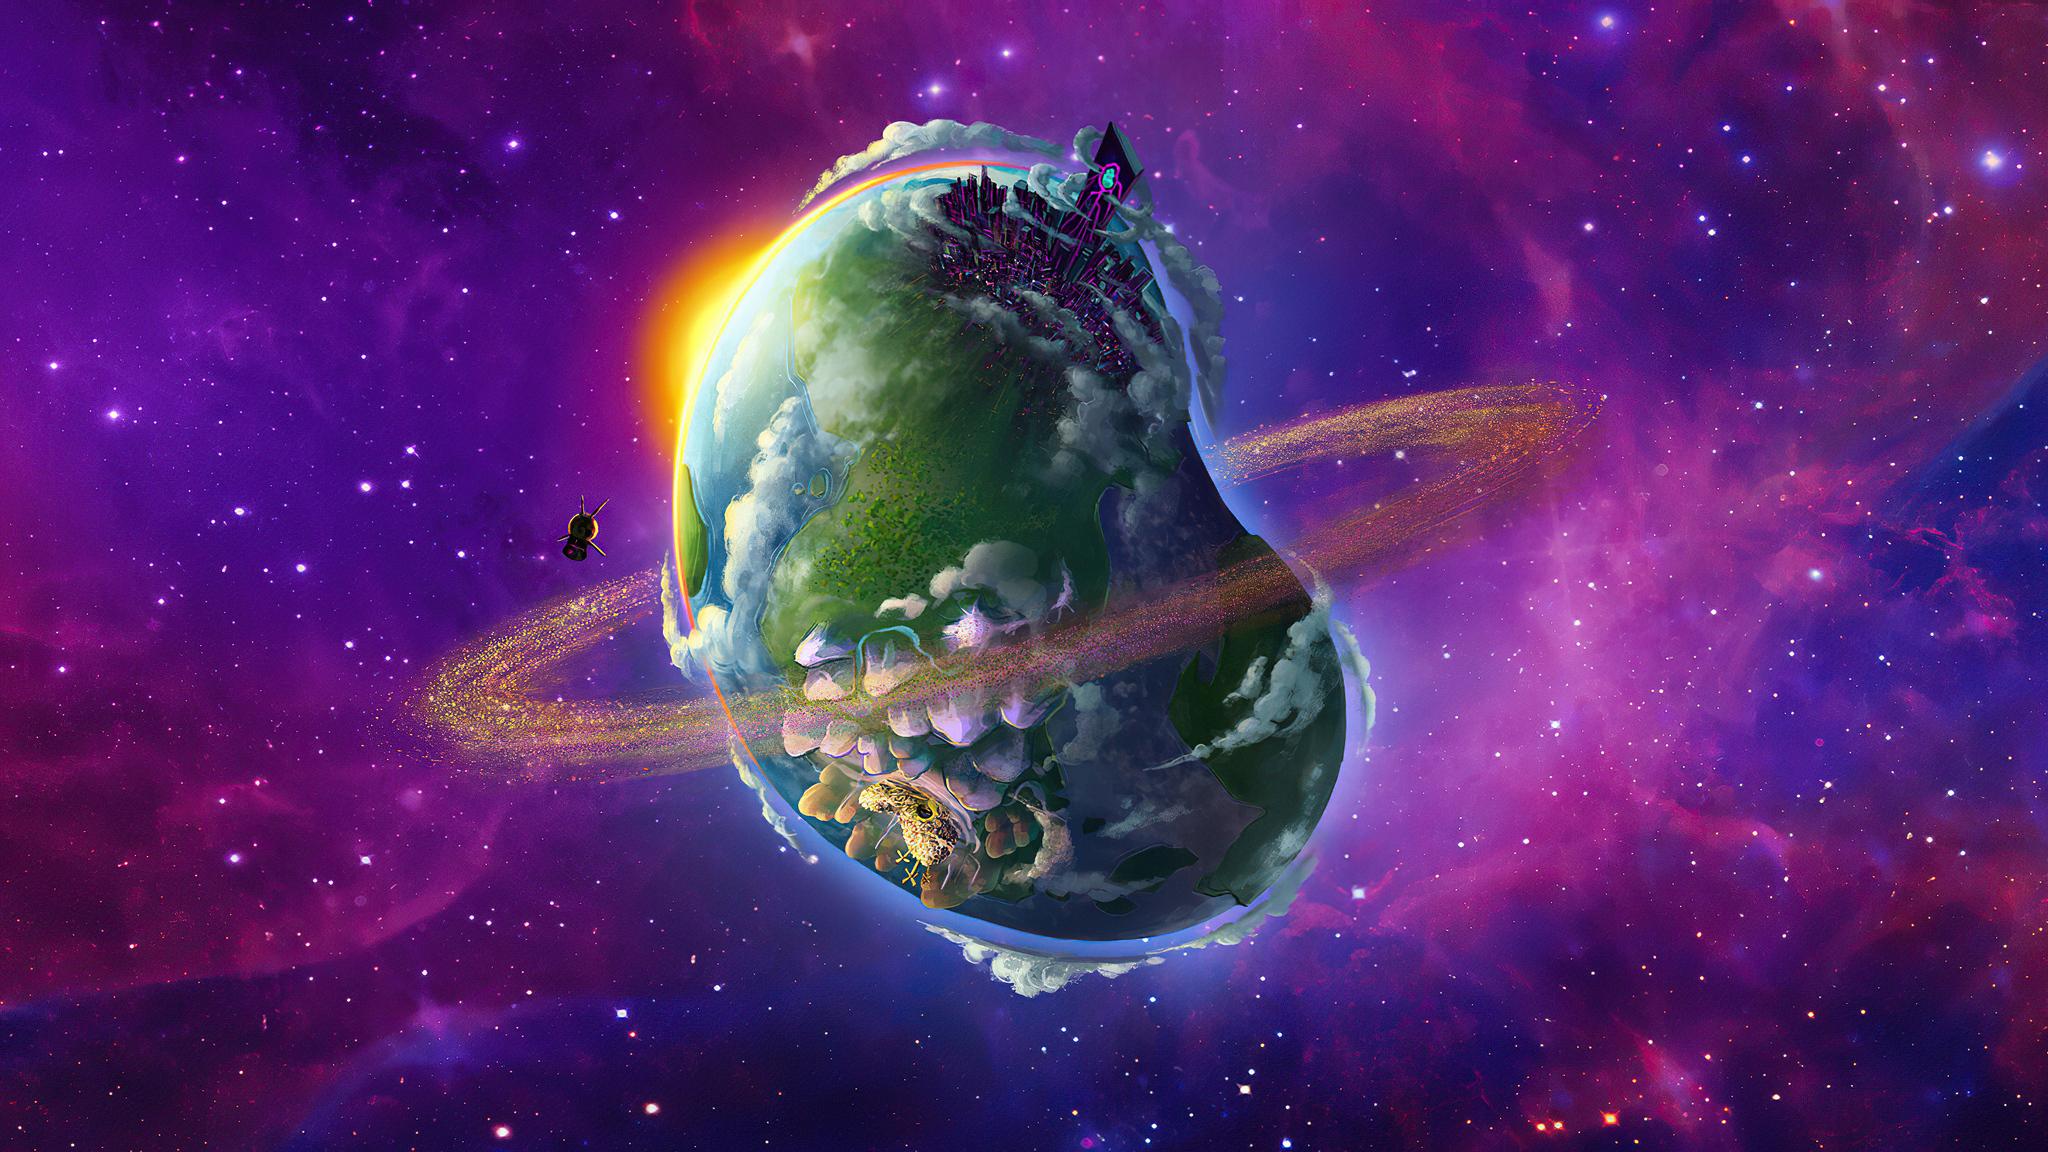 jb-planet-4k-uq.jpg